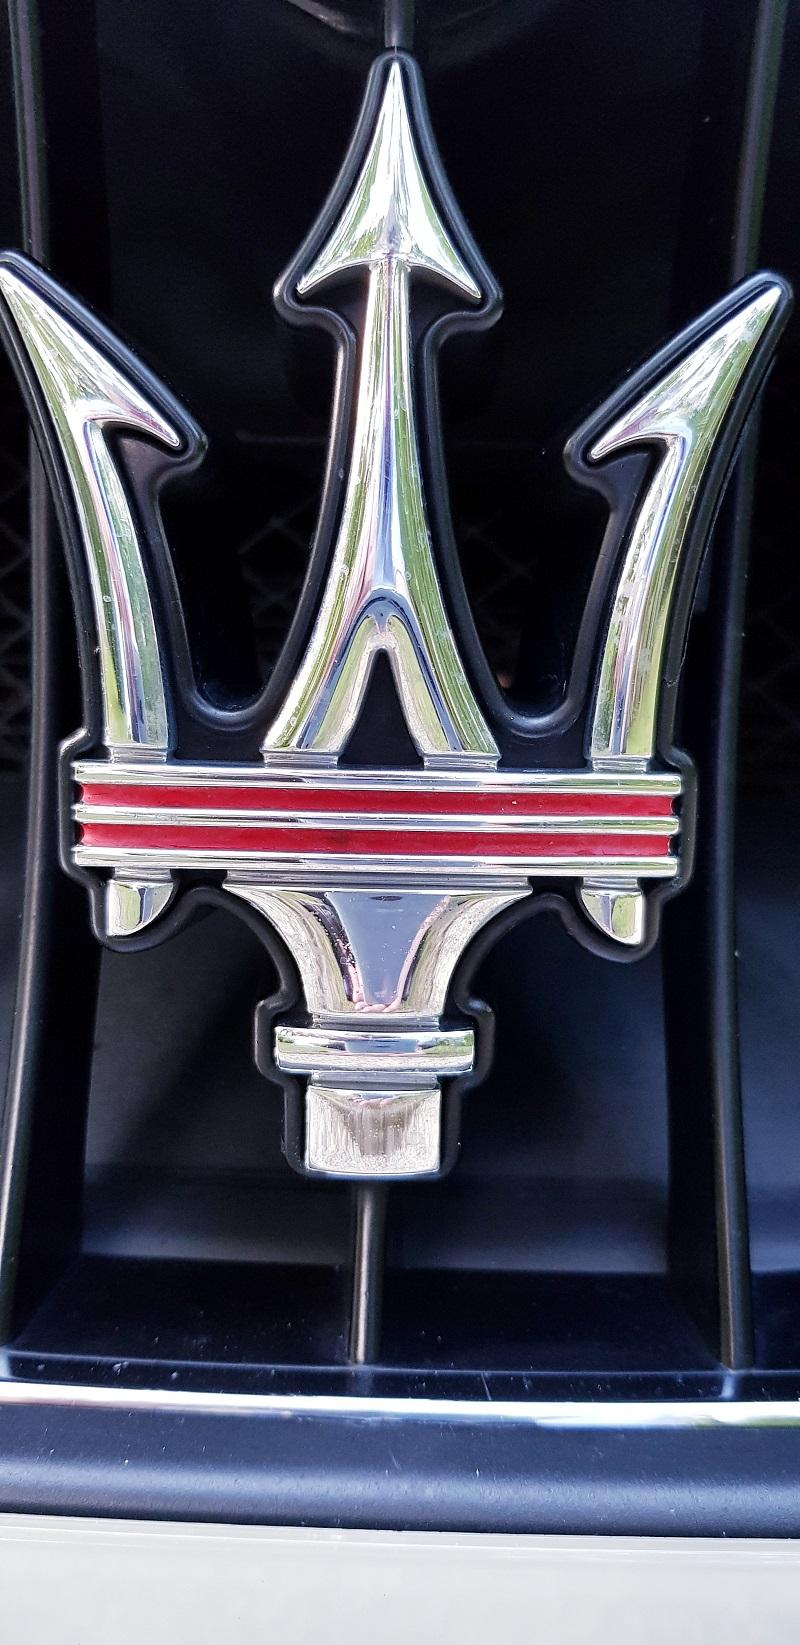 Quattroporte S 4.7 GTS Look - 2008  20180718